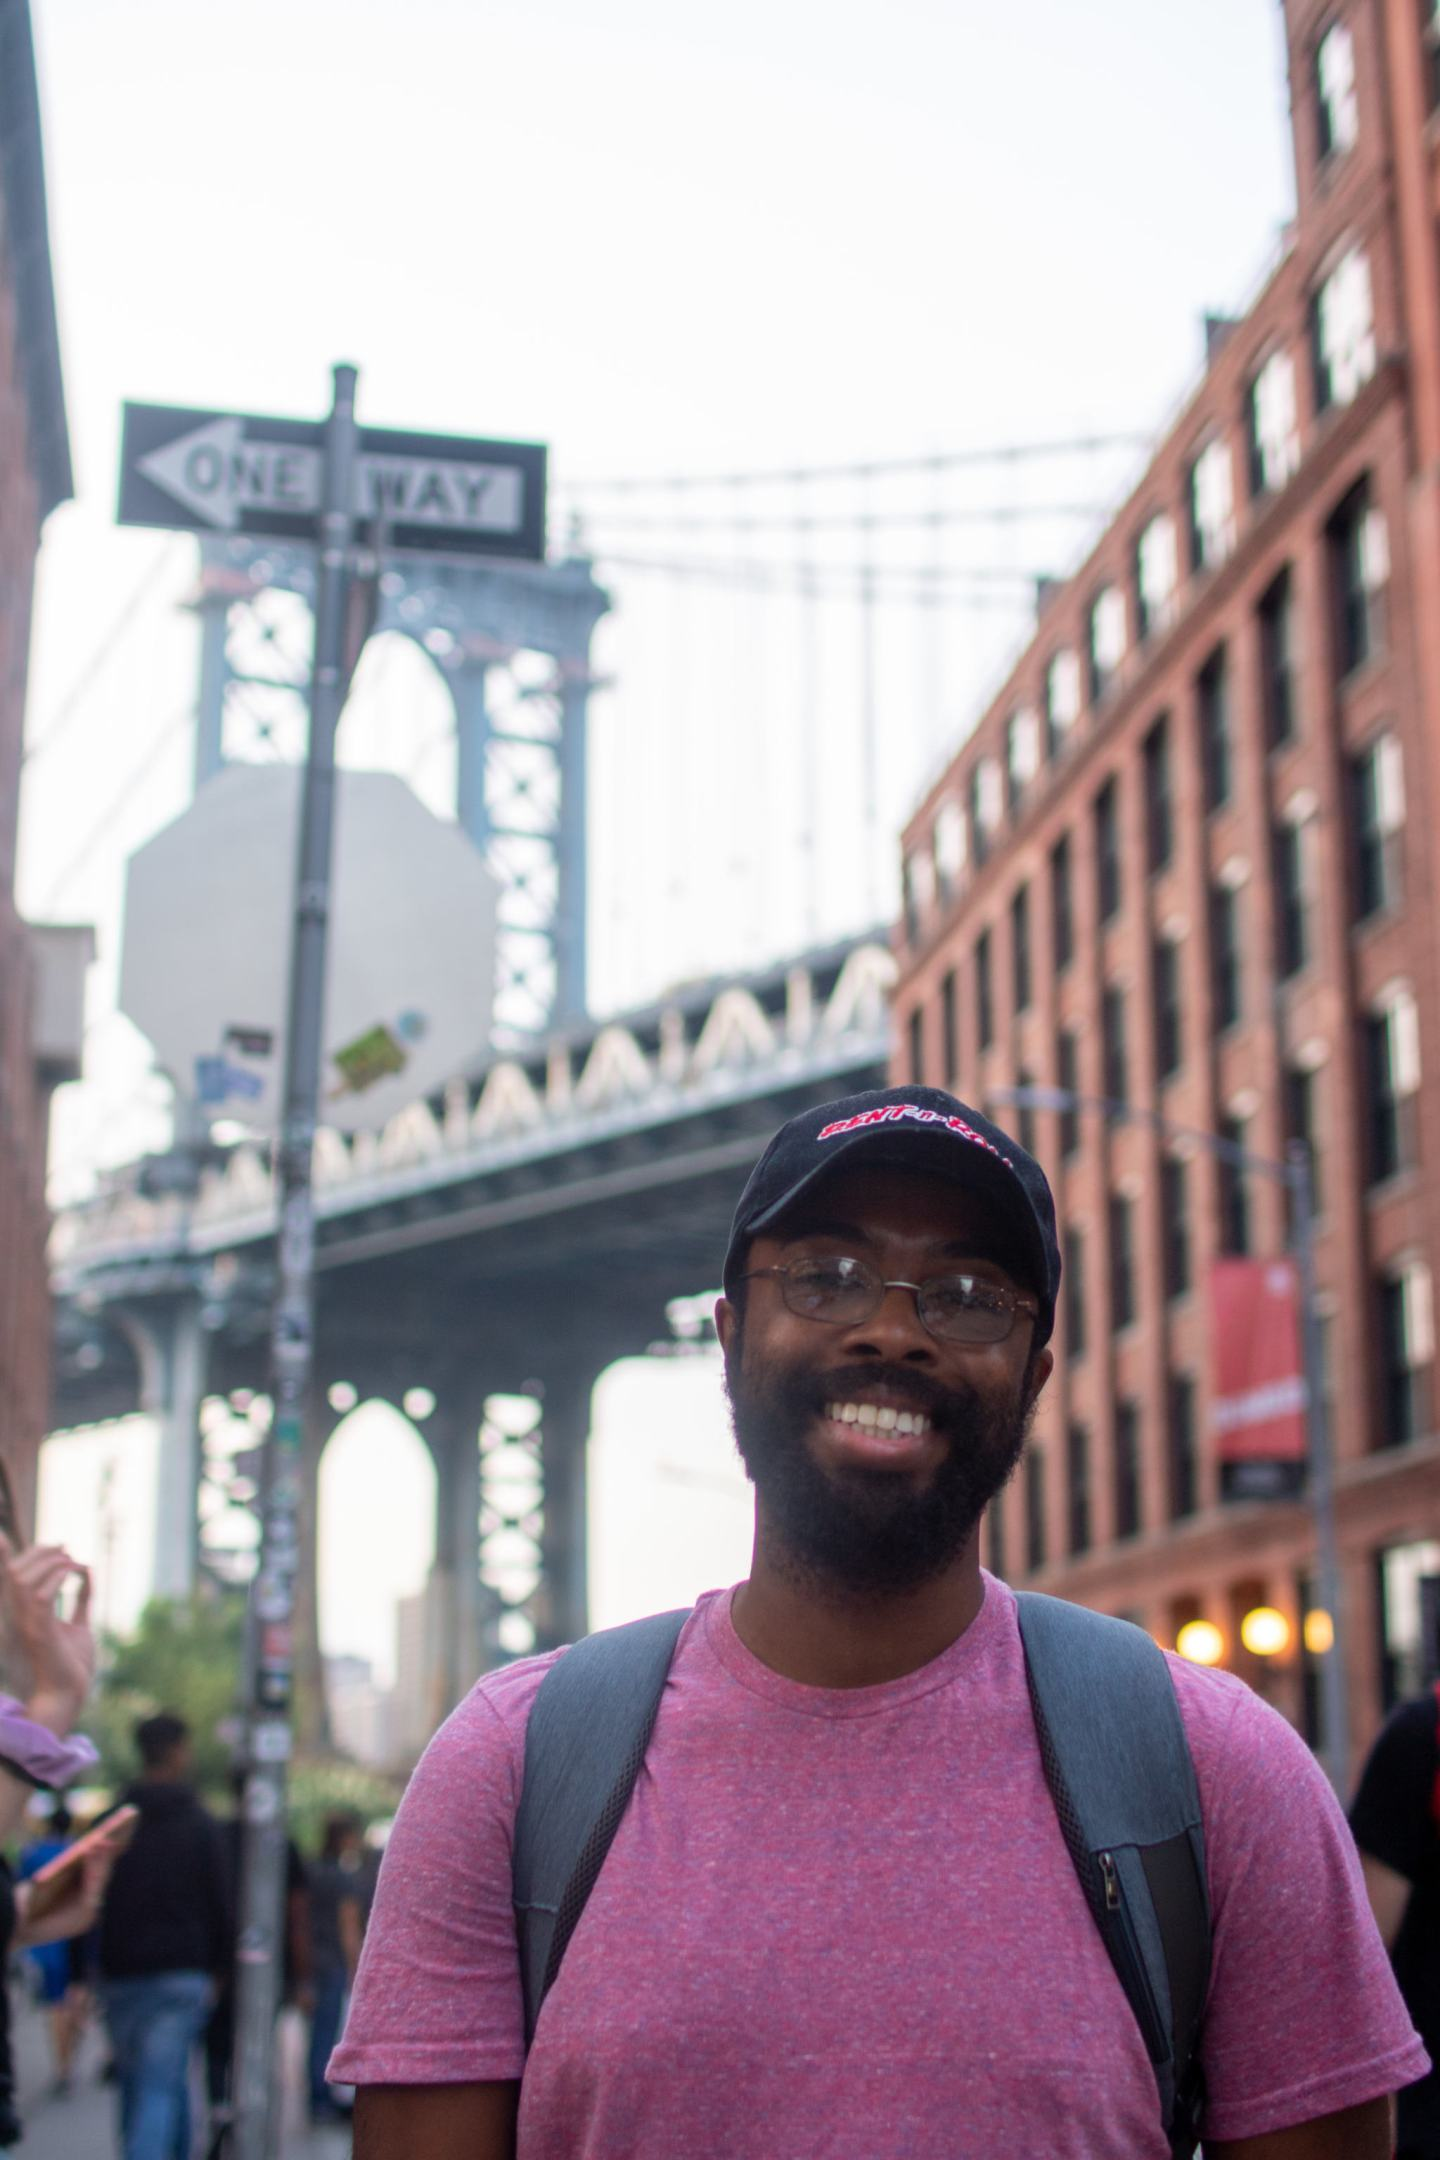 Chris standing in front of the Manhattan Bridge in New York